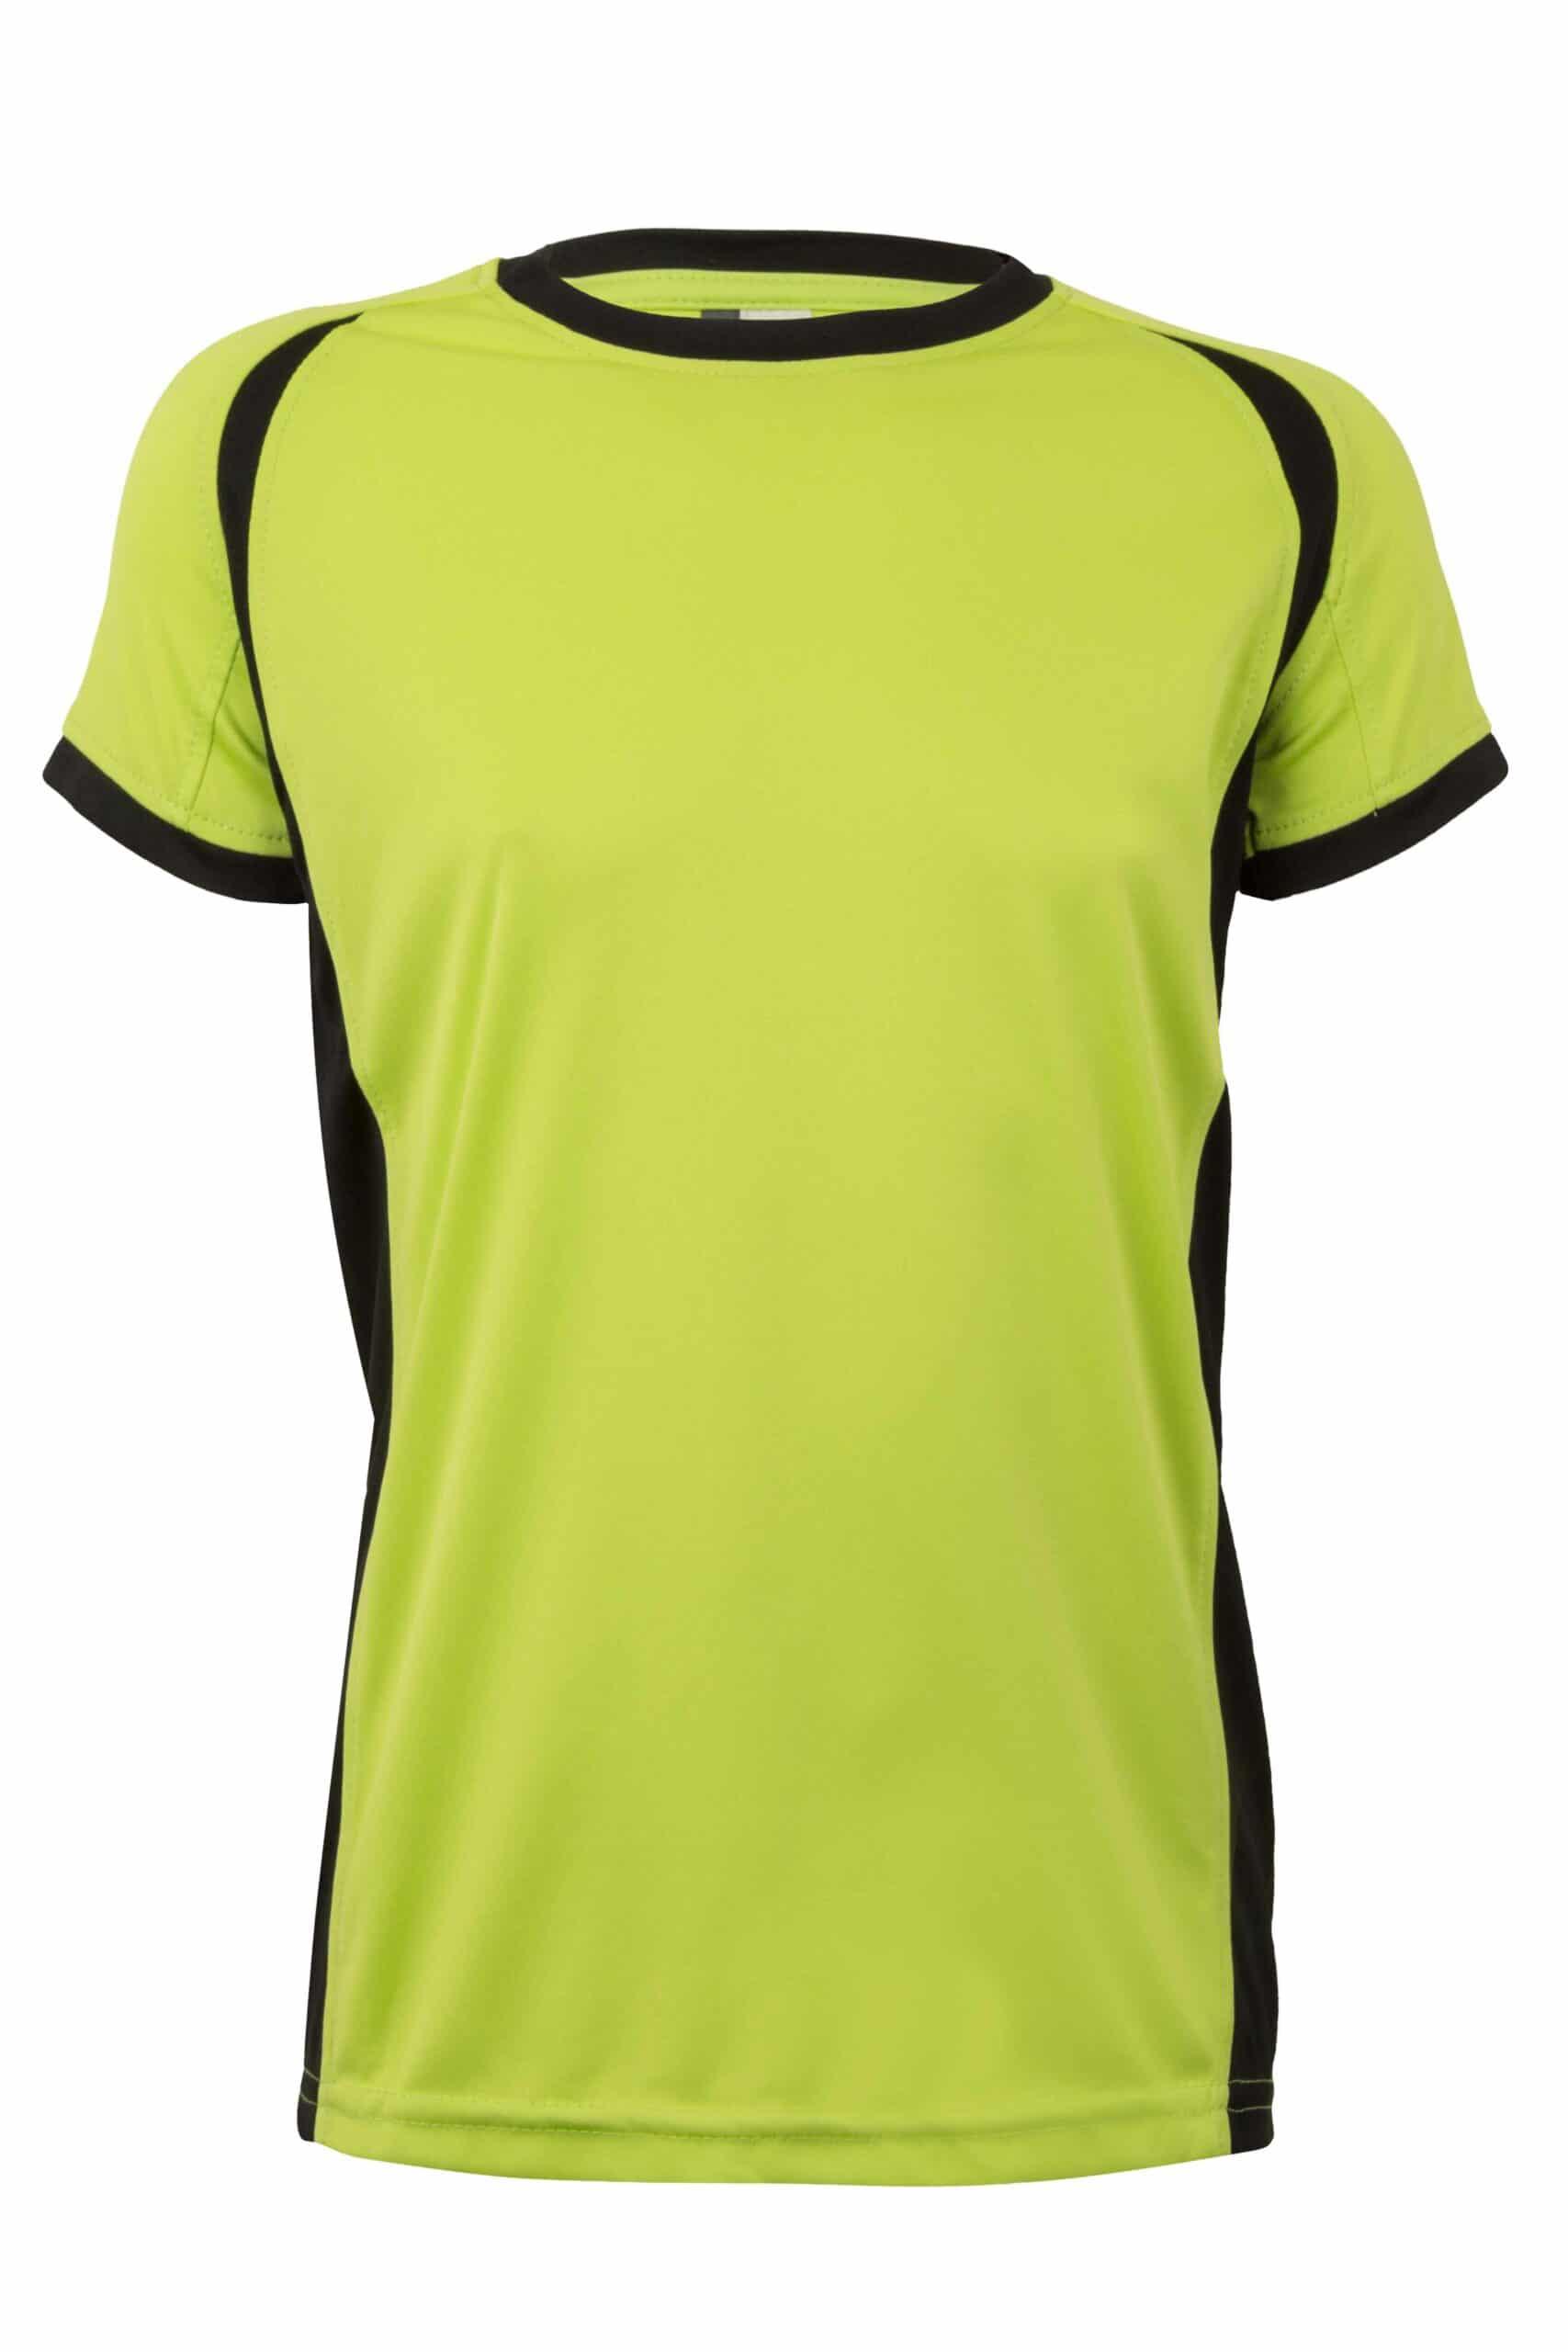 Mukua Mk531v Camiseta TÉcnica Manga Corta Bicolor NiÑo FlÚor Yellow Black 1